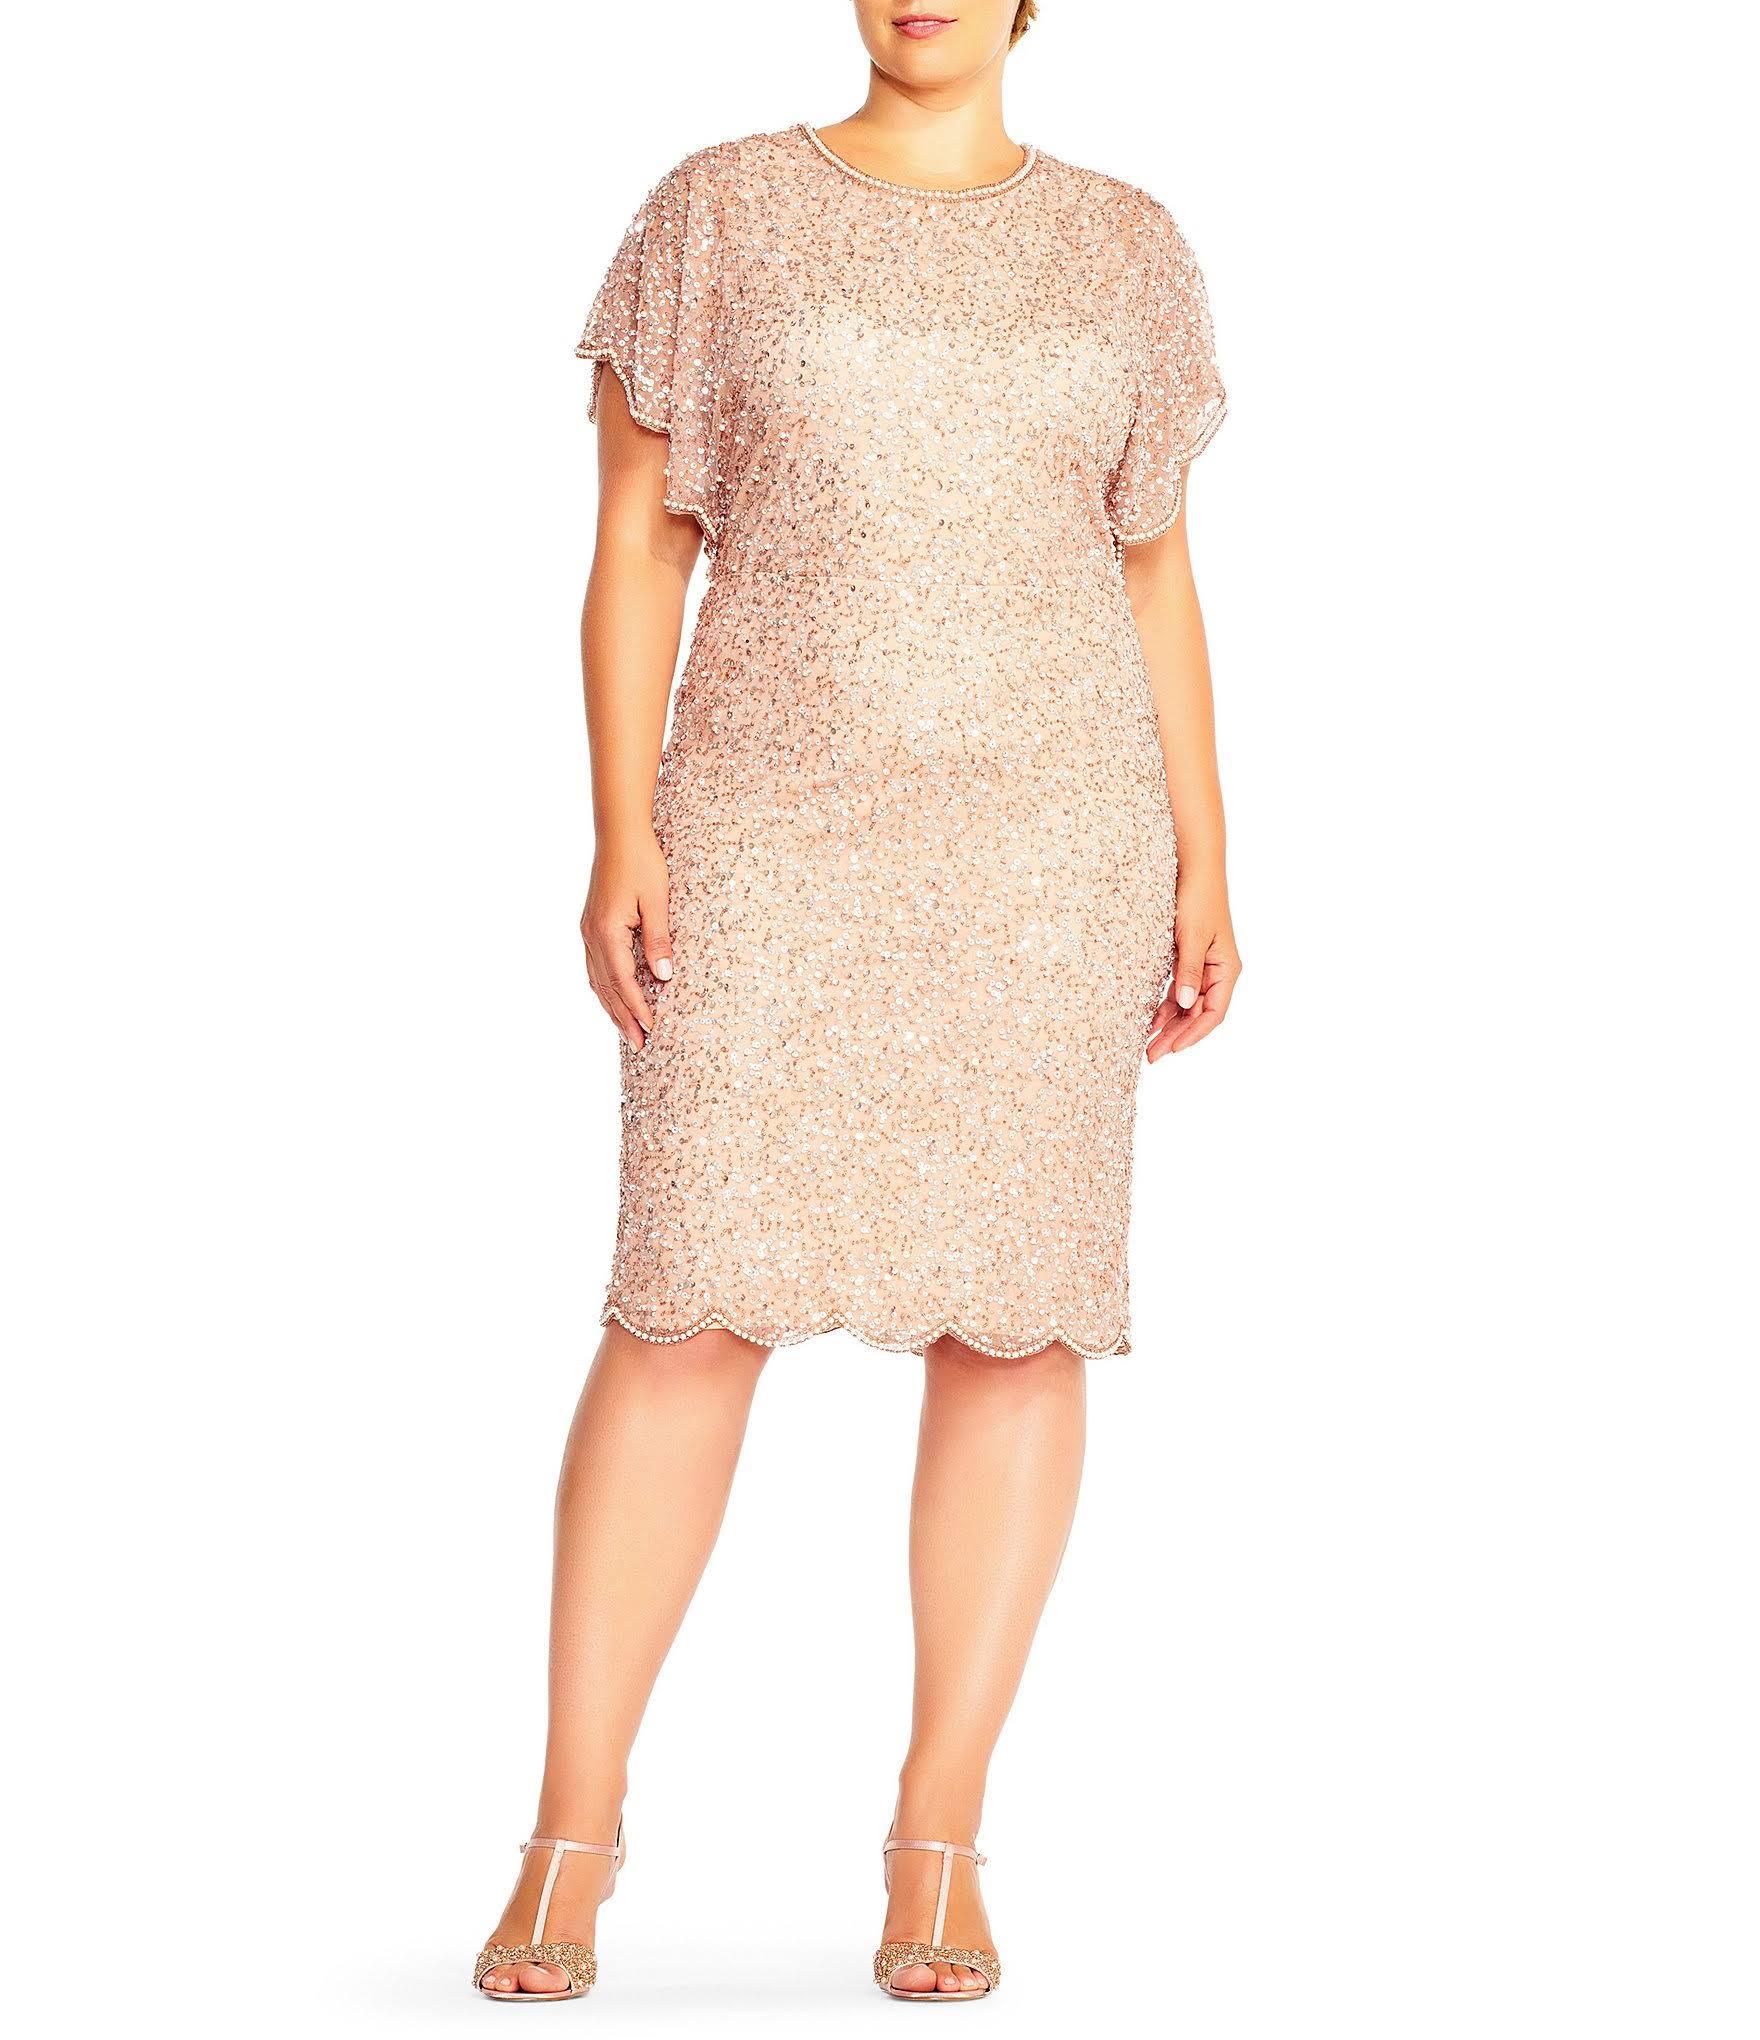 Papell Perlenbesatz Flatterhülse Plus Kleid Rotgold Und Adrianna Mit PwgqPd